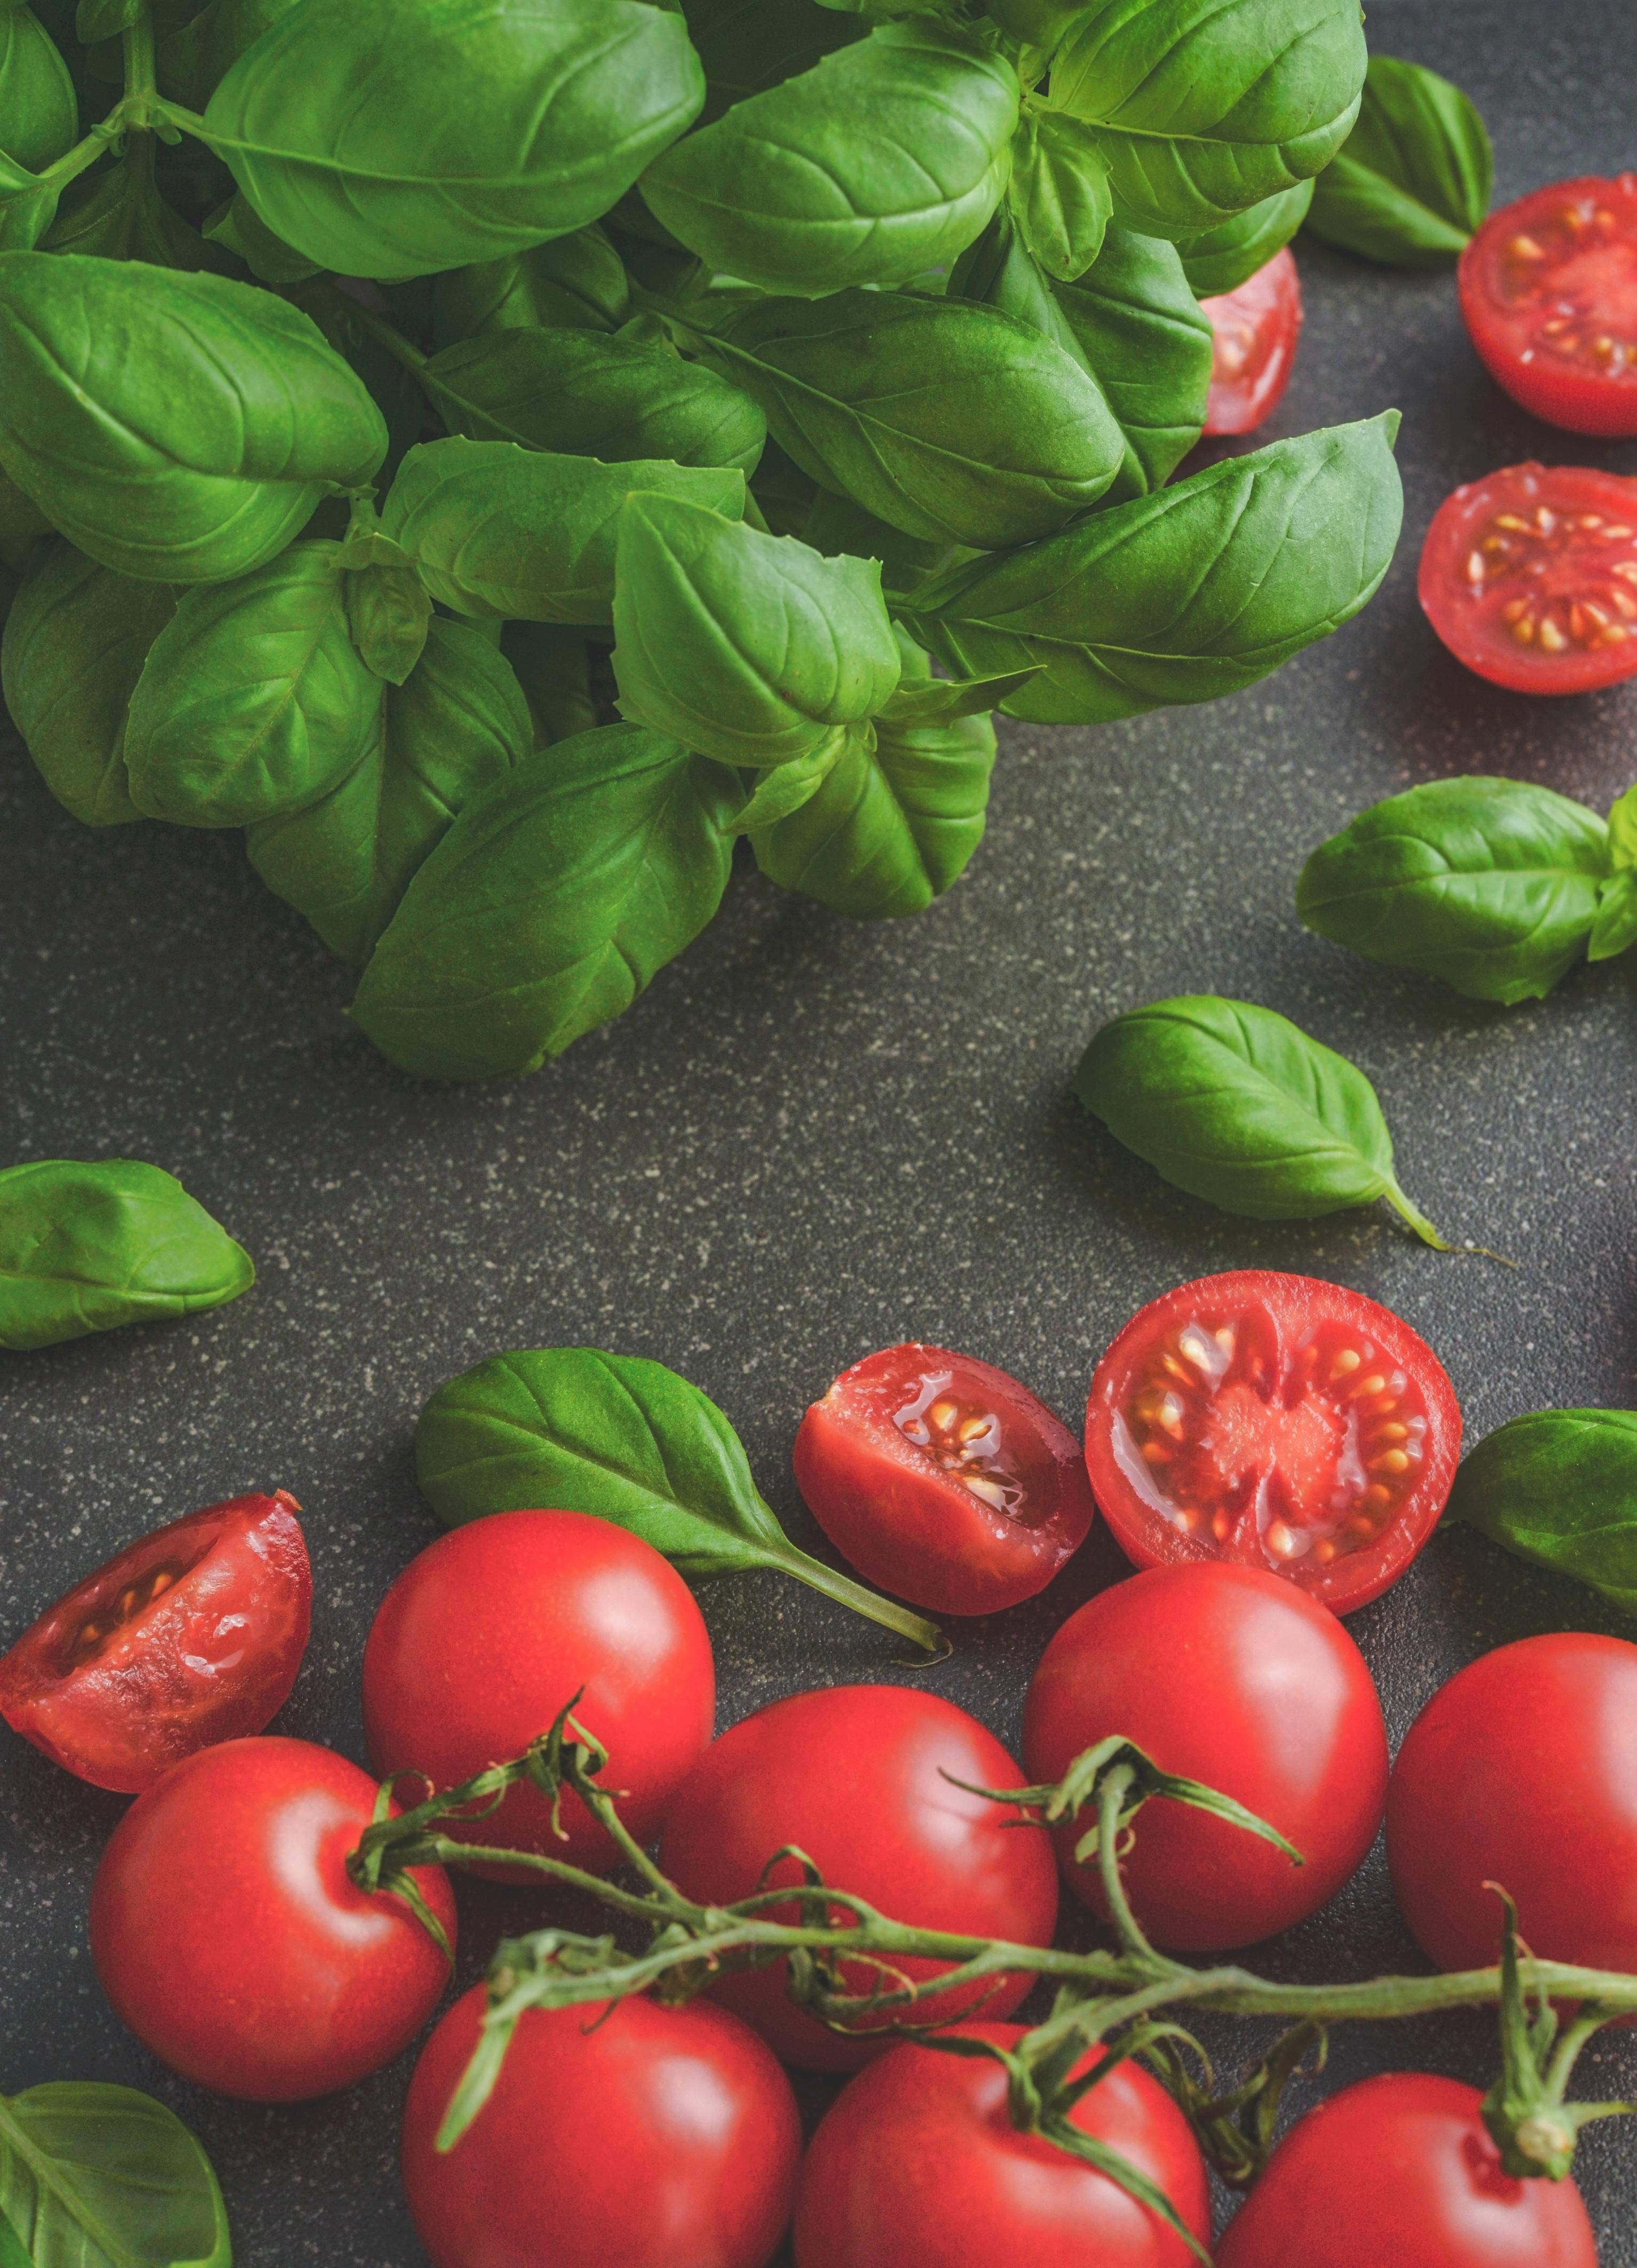 , Impressive Health And Wellness Benefit Of Chlorella: Decrease Heart Disease